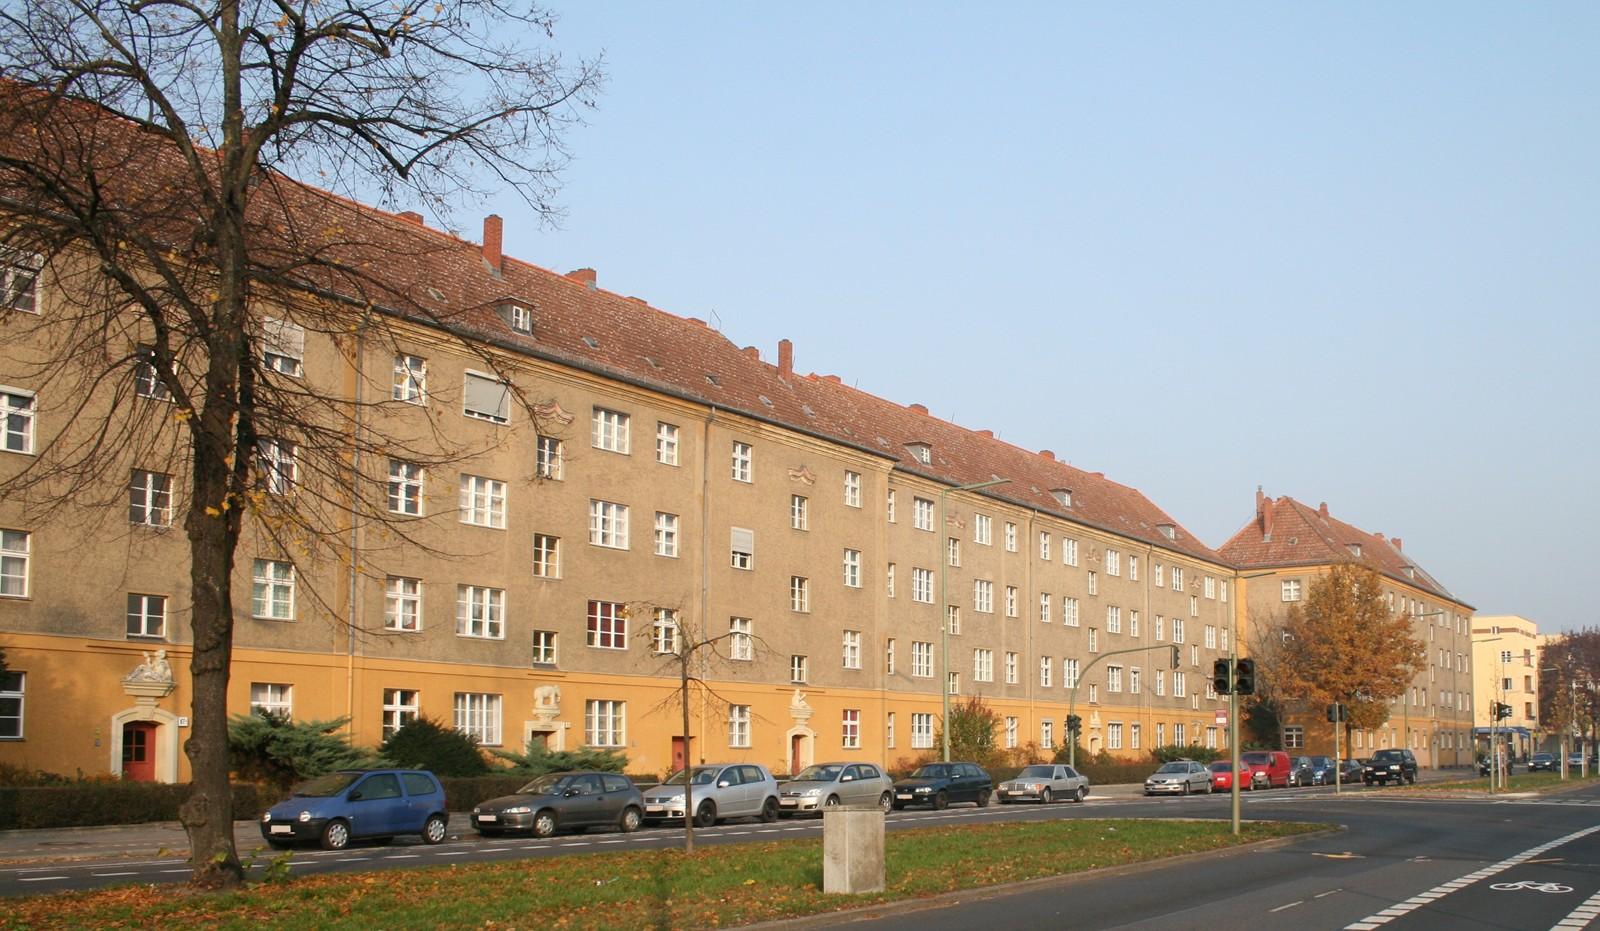 liste der kulturdenkmale in berlin hakenfelde. Black Bedroom Furniture Sets. Home Design Ideas